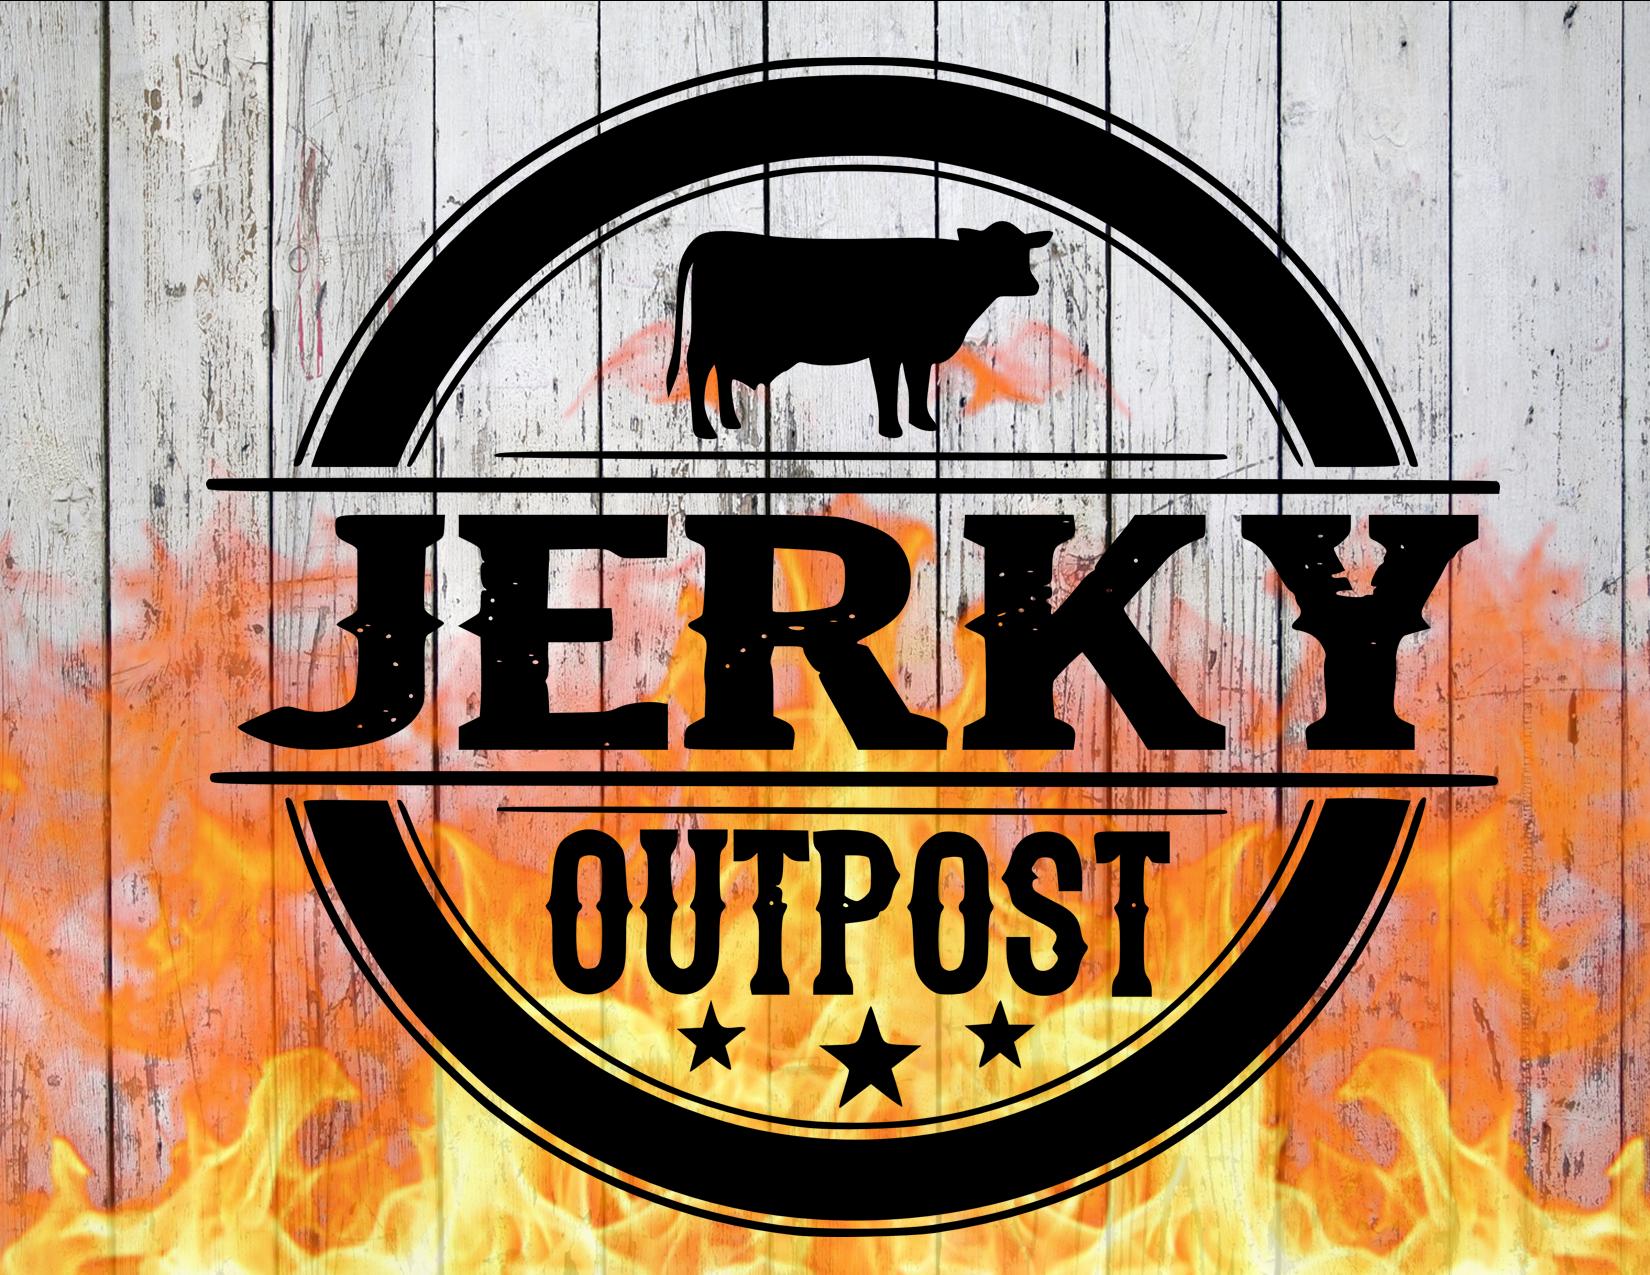 Jerky Outpost – Jerky Membership Club